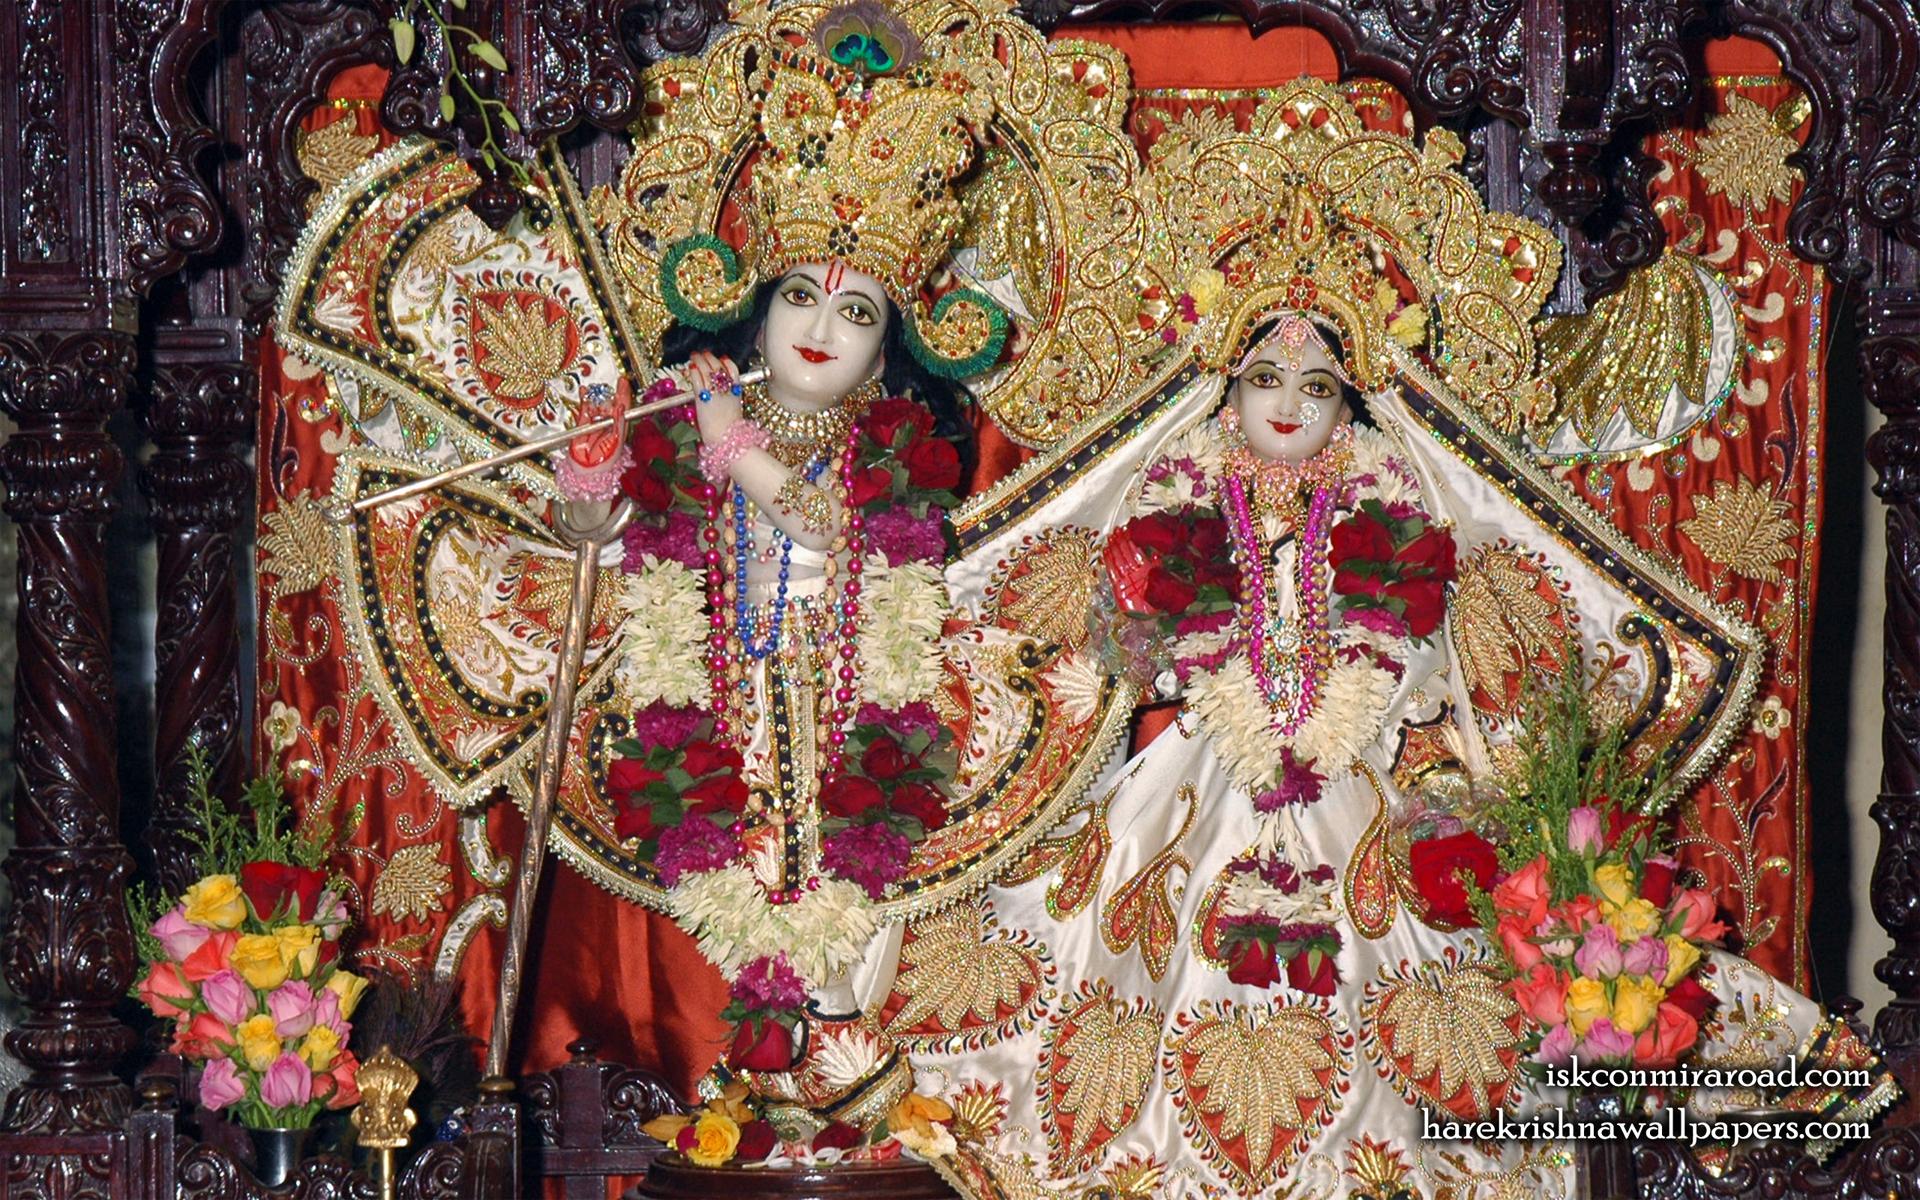 Sri Sri Radha Giridhari Wallpaper (015) Size 1920x1200 Download